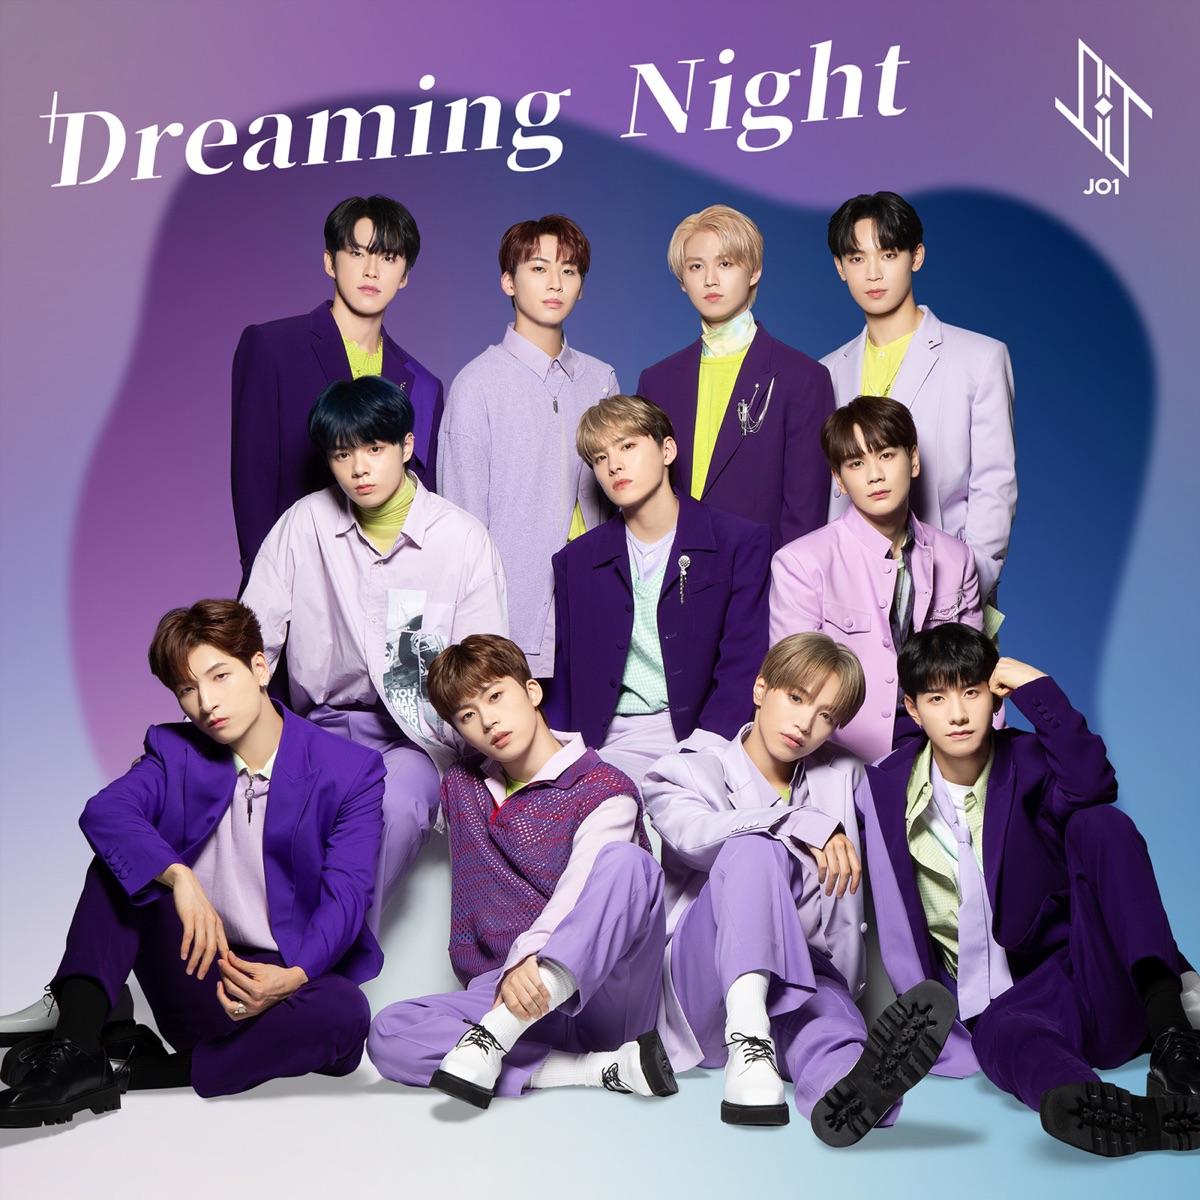 『JO1 - Dreaming Night』収録の『Dreaming Night』ジャケット